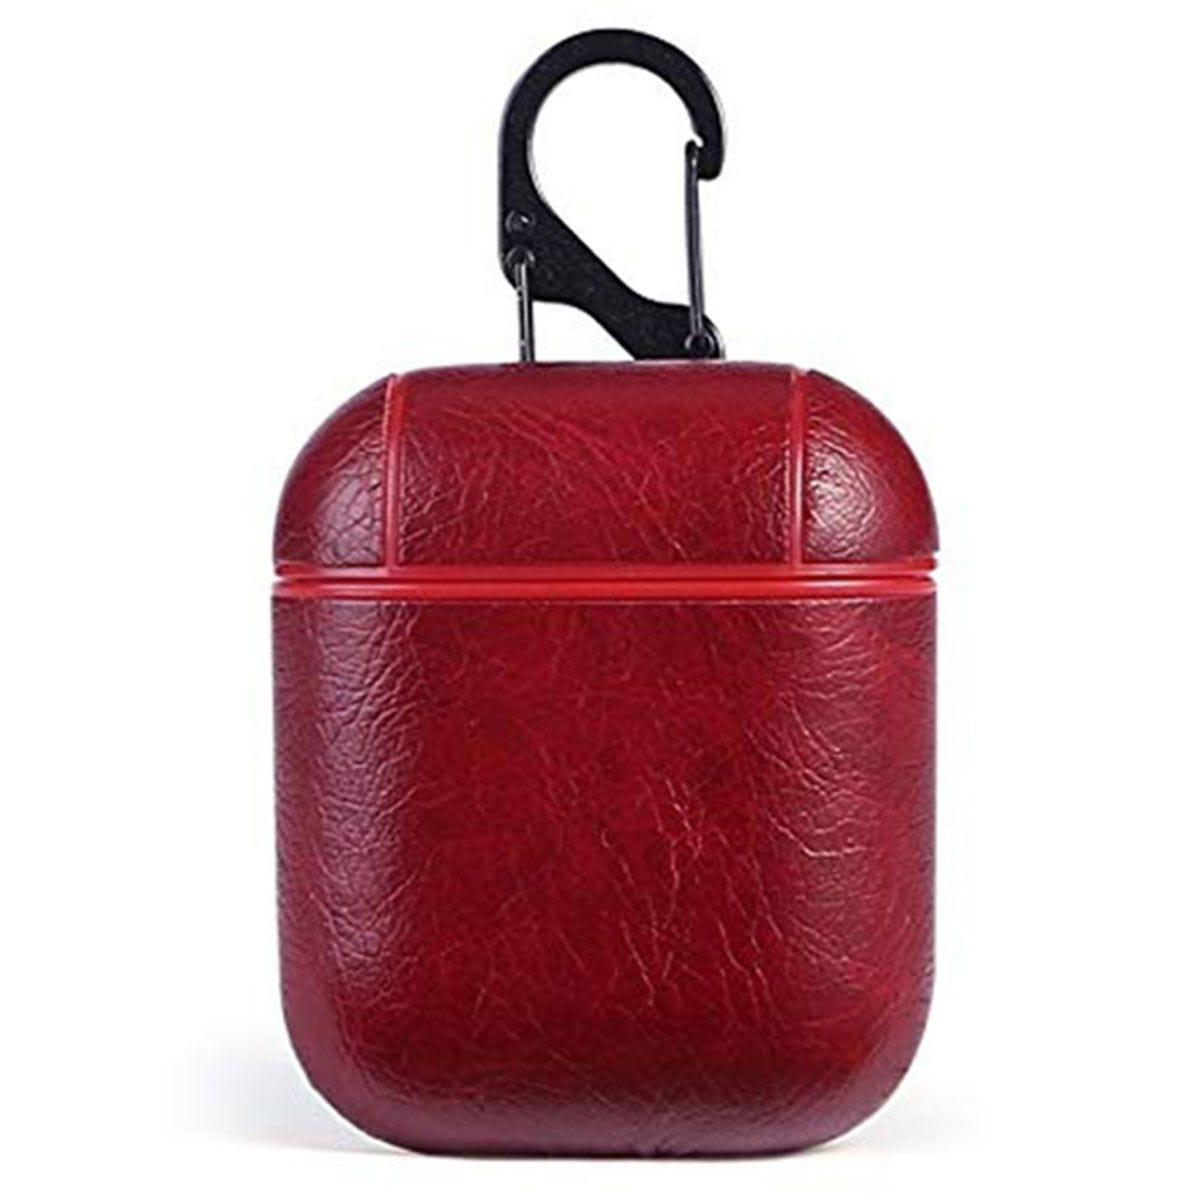 Aquarius Luxury Leather Case for EarPod - Red